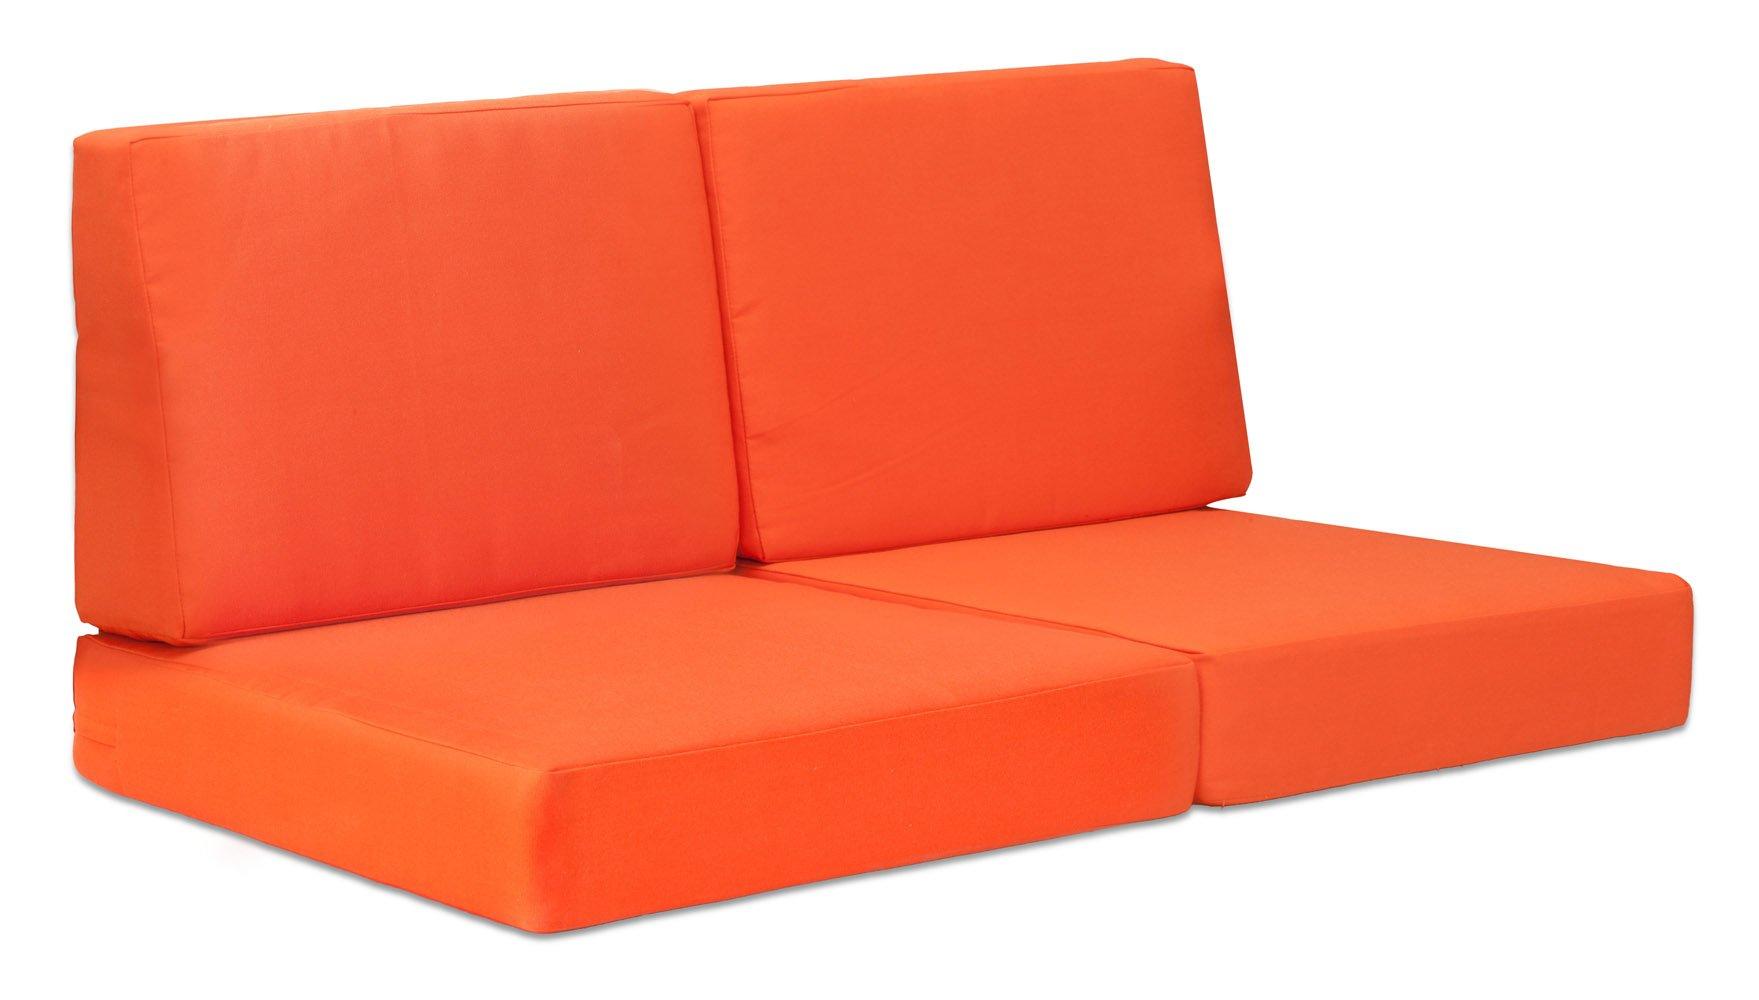 Sofa Pads Cushion Pads For Keter Allibert California